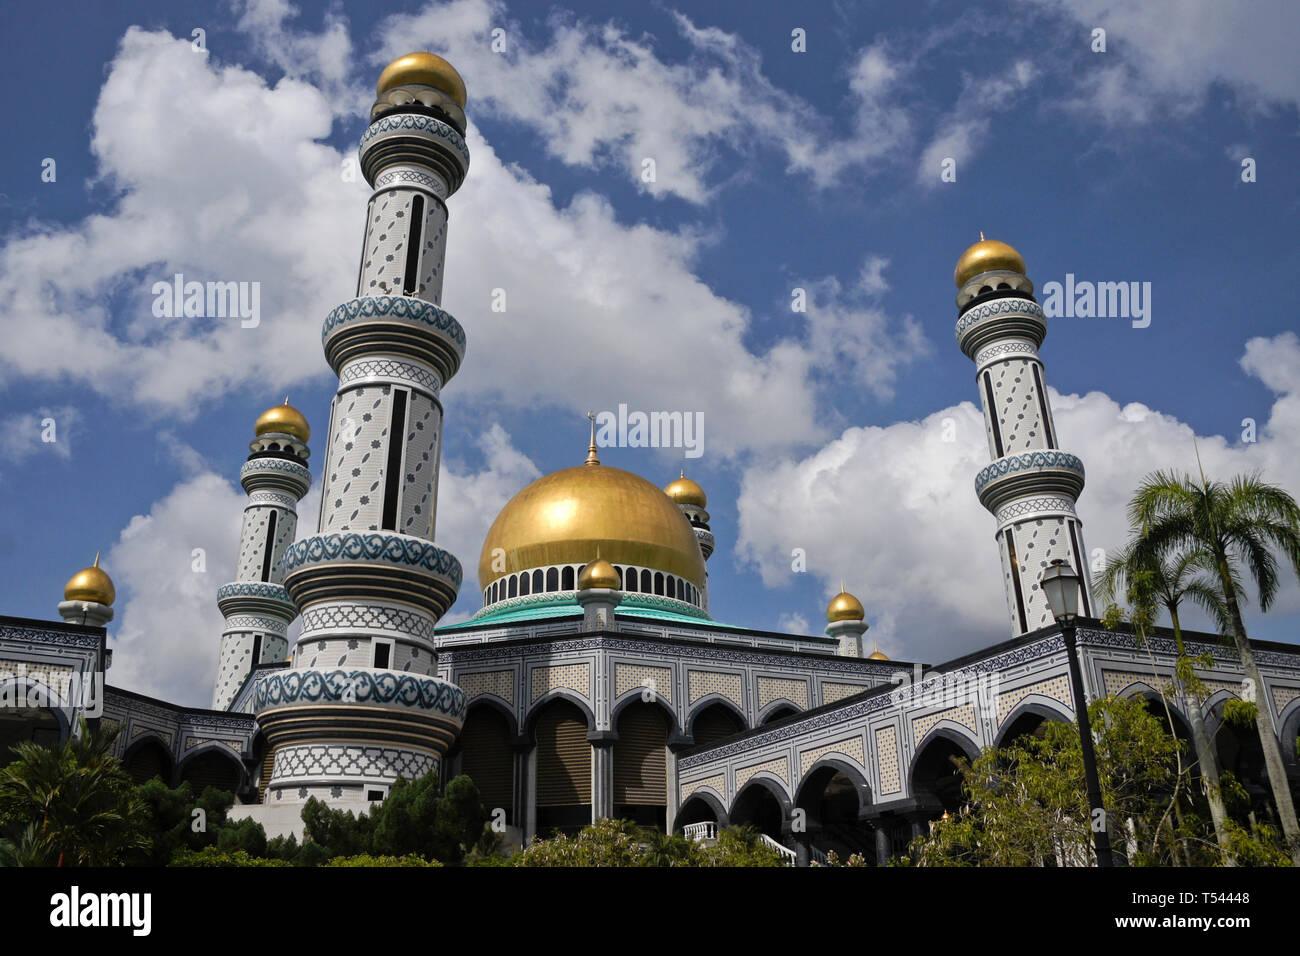 Jame' Asr Hassanil Bolkiah Mosque, Bandar Seri Begawan, Sultanate of Brunei - Stock Image